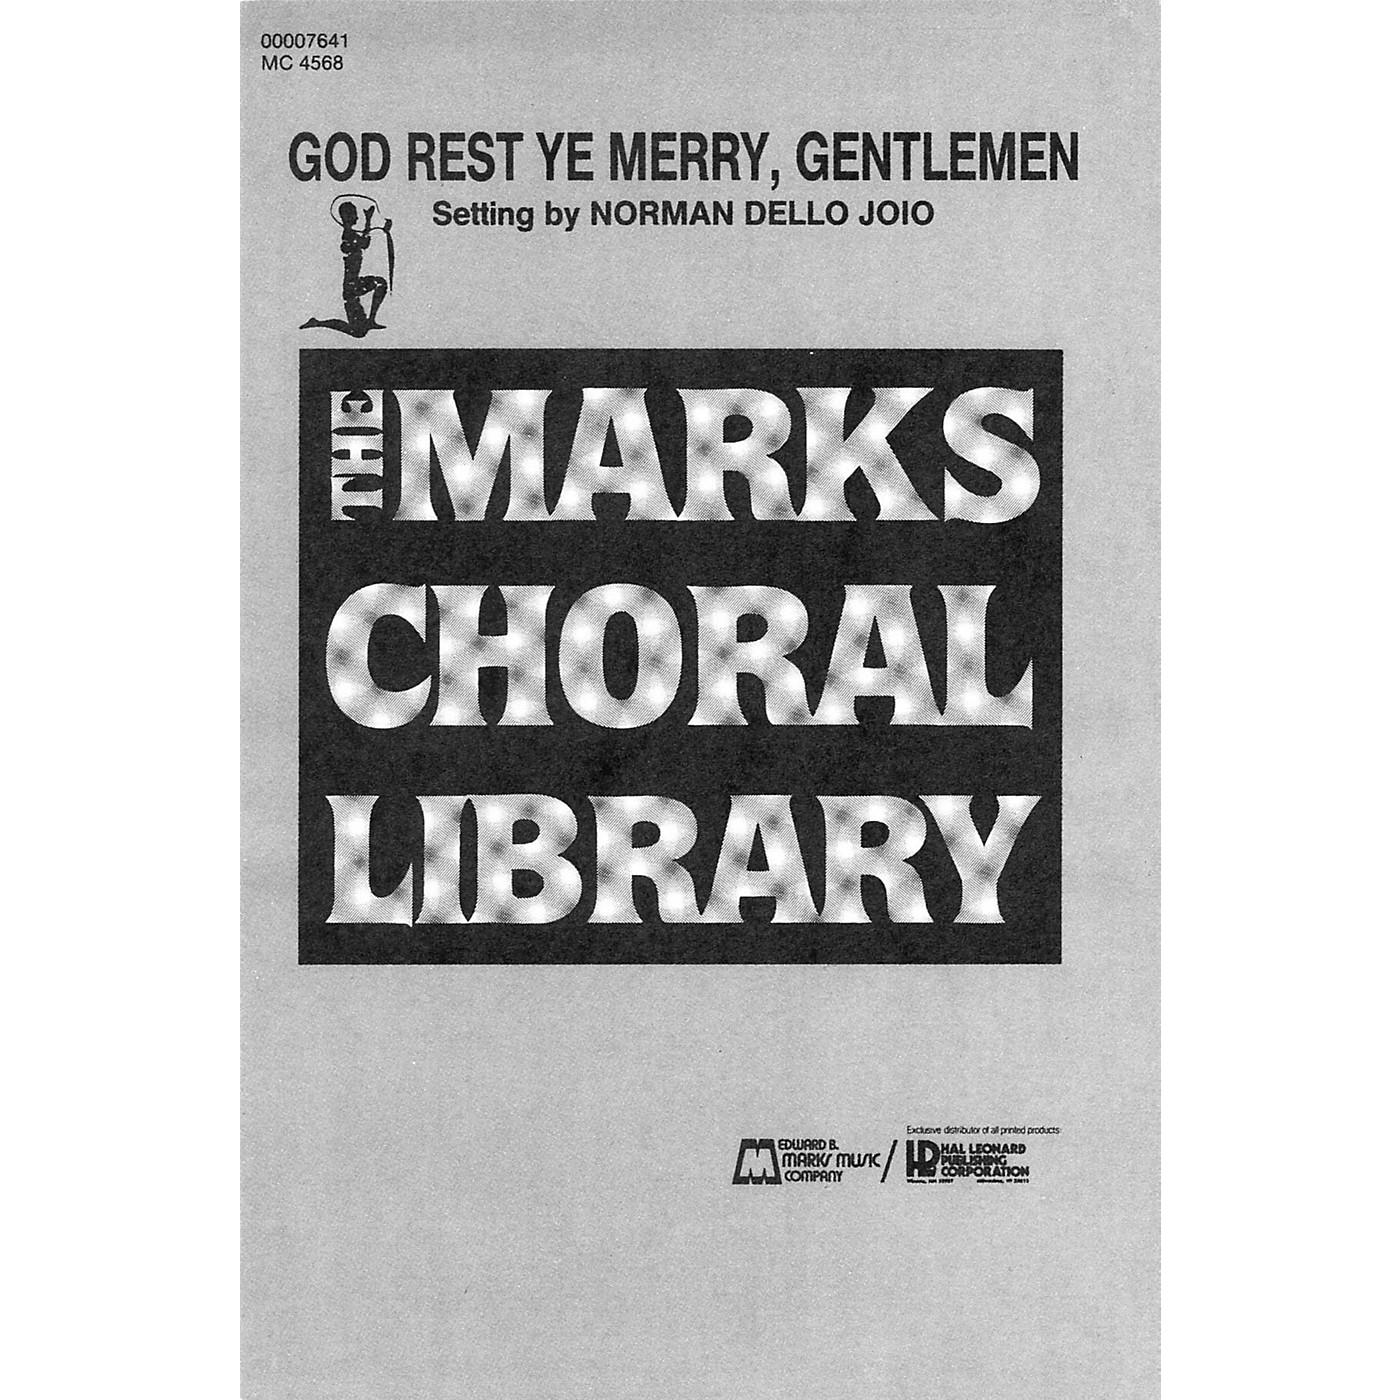 Hal Leonard God Rest Ye, Merry Gentlemen (SATB, piano 4 hands) SATB thumbnail